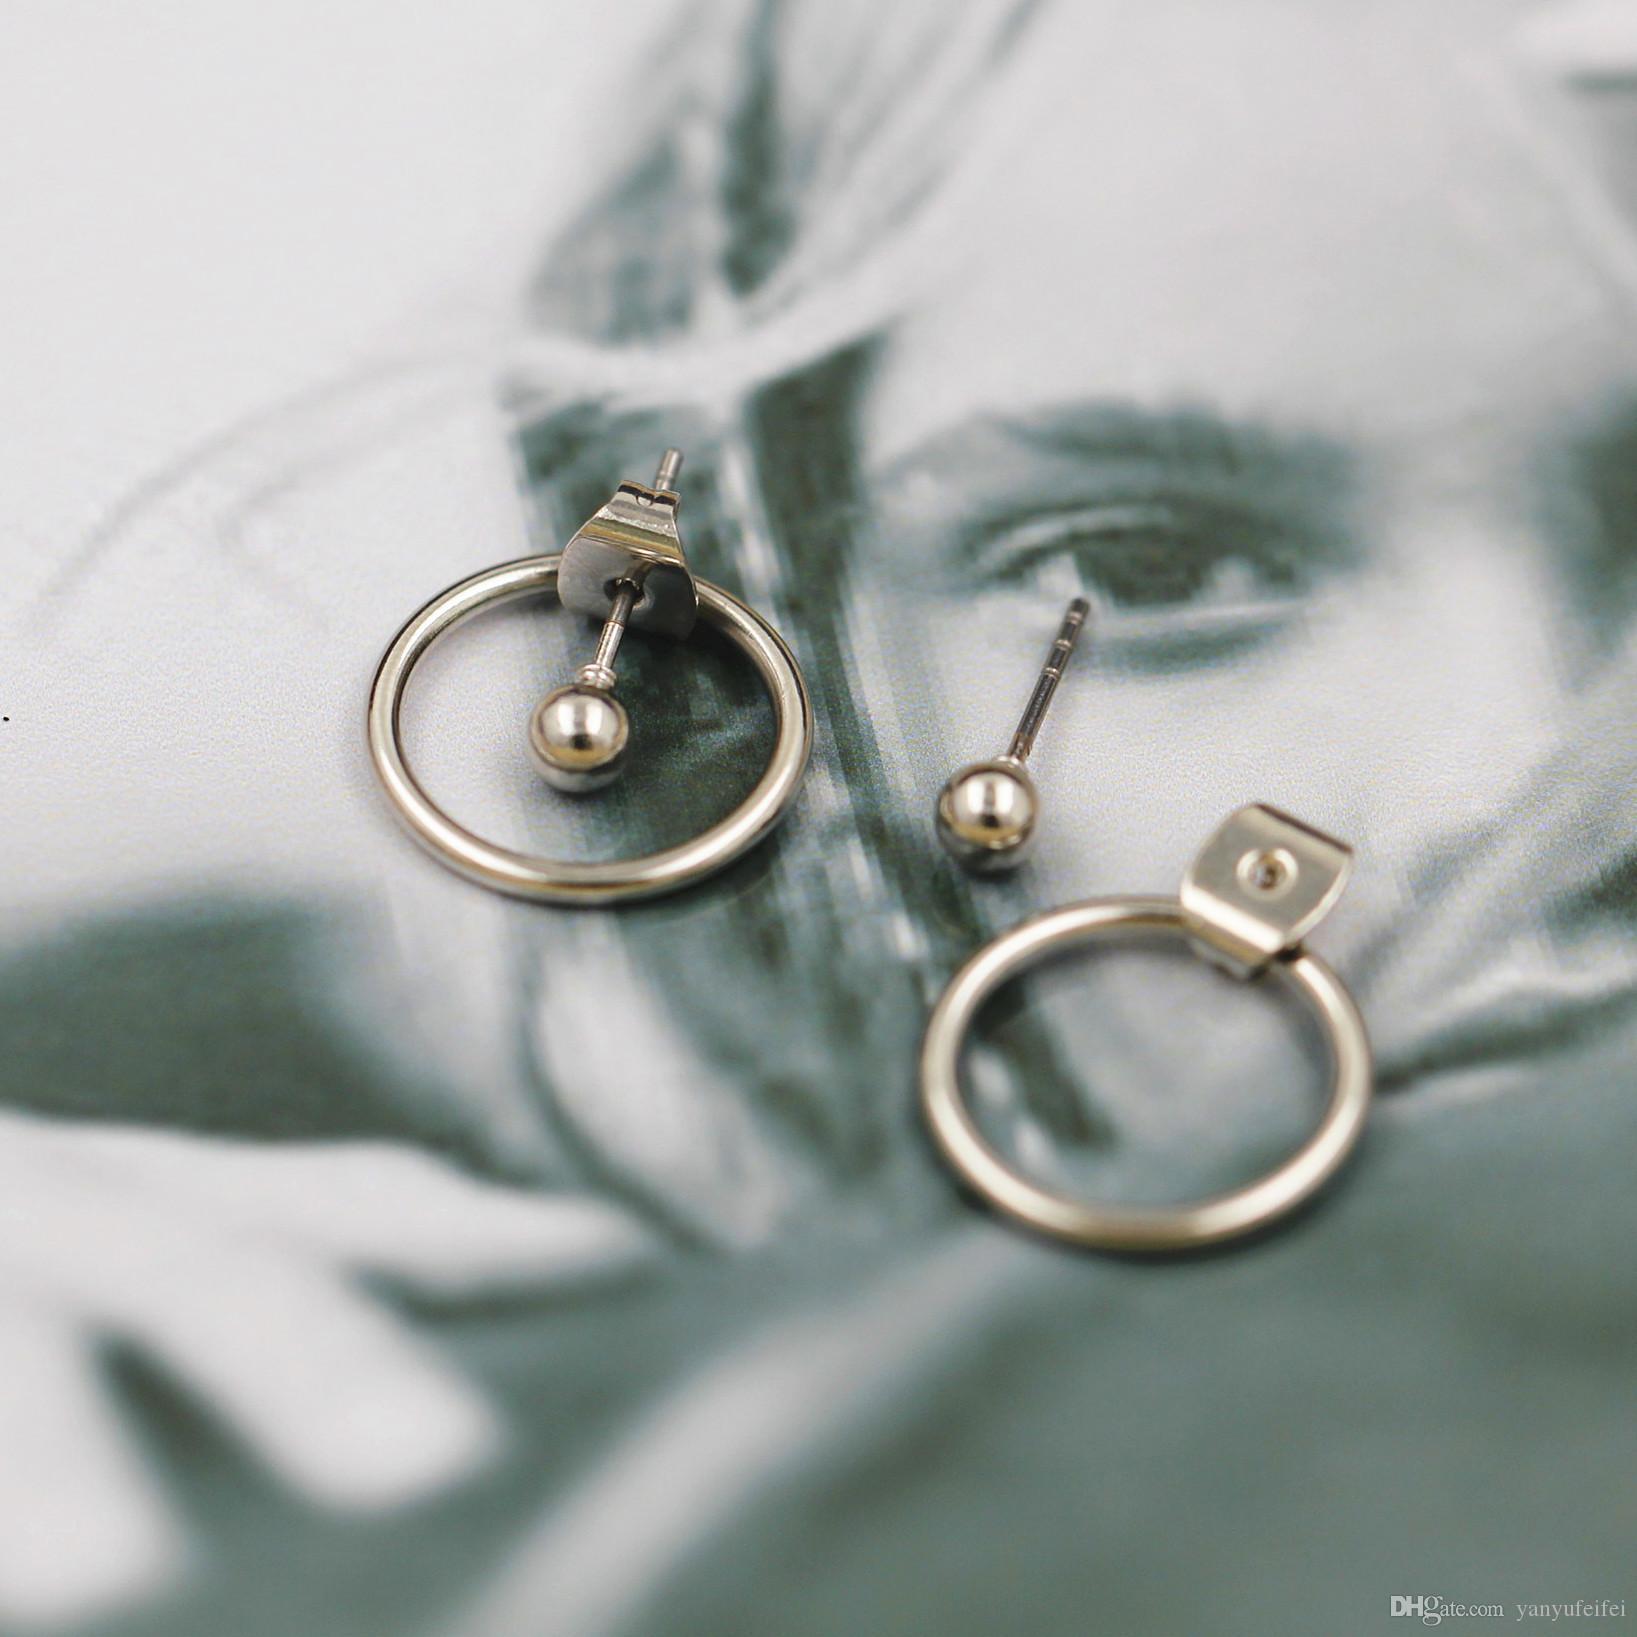 Qingdao Europe Japan Japan and South Korea jewelry minimalist style geometric round metal back hanging earrings earrings earrings men and